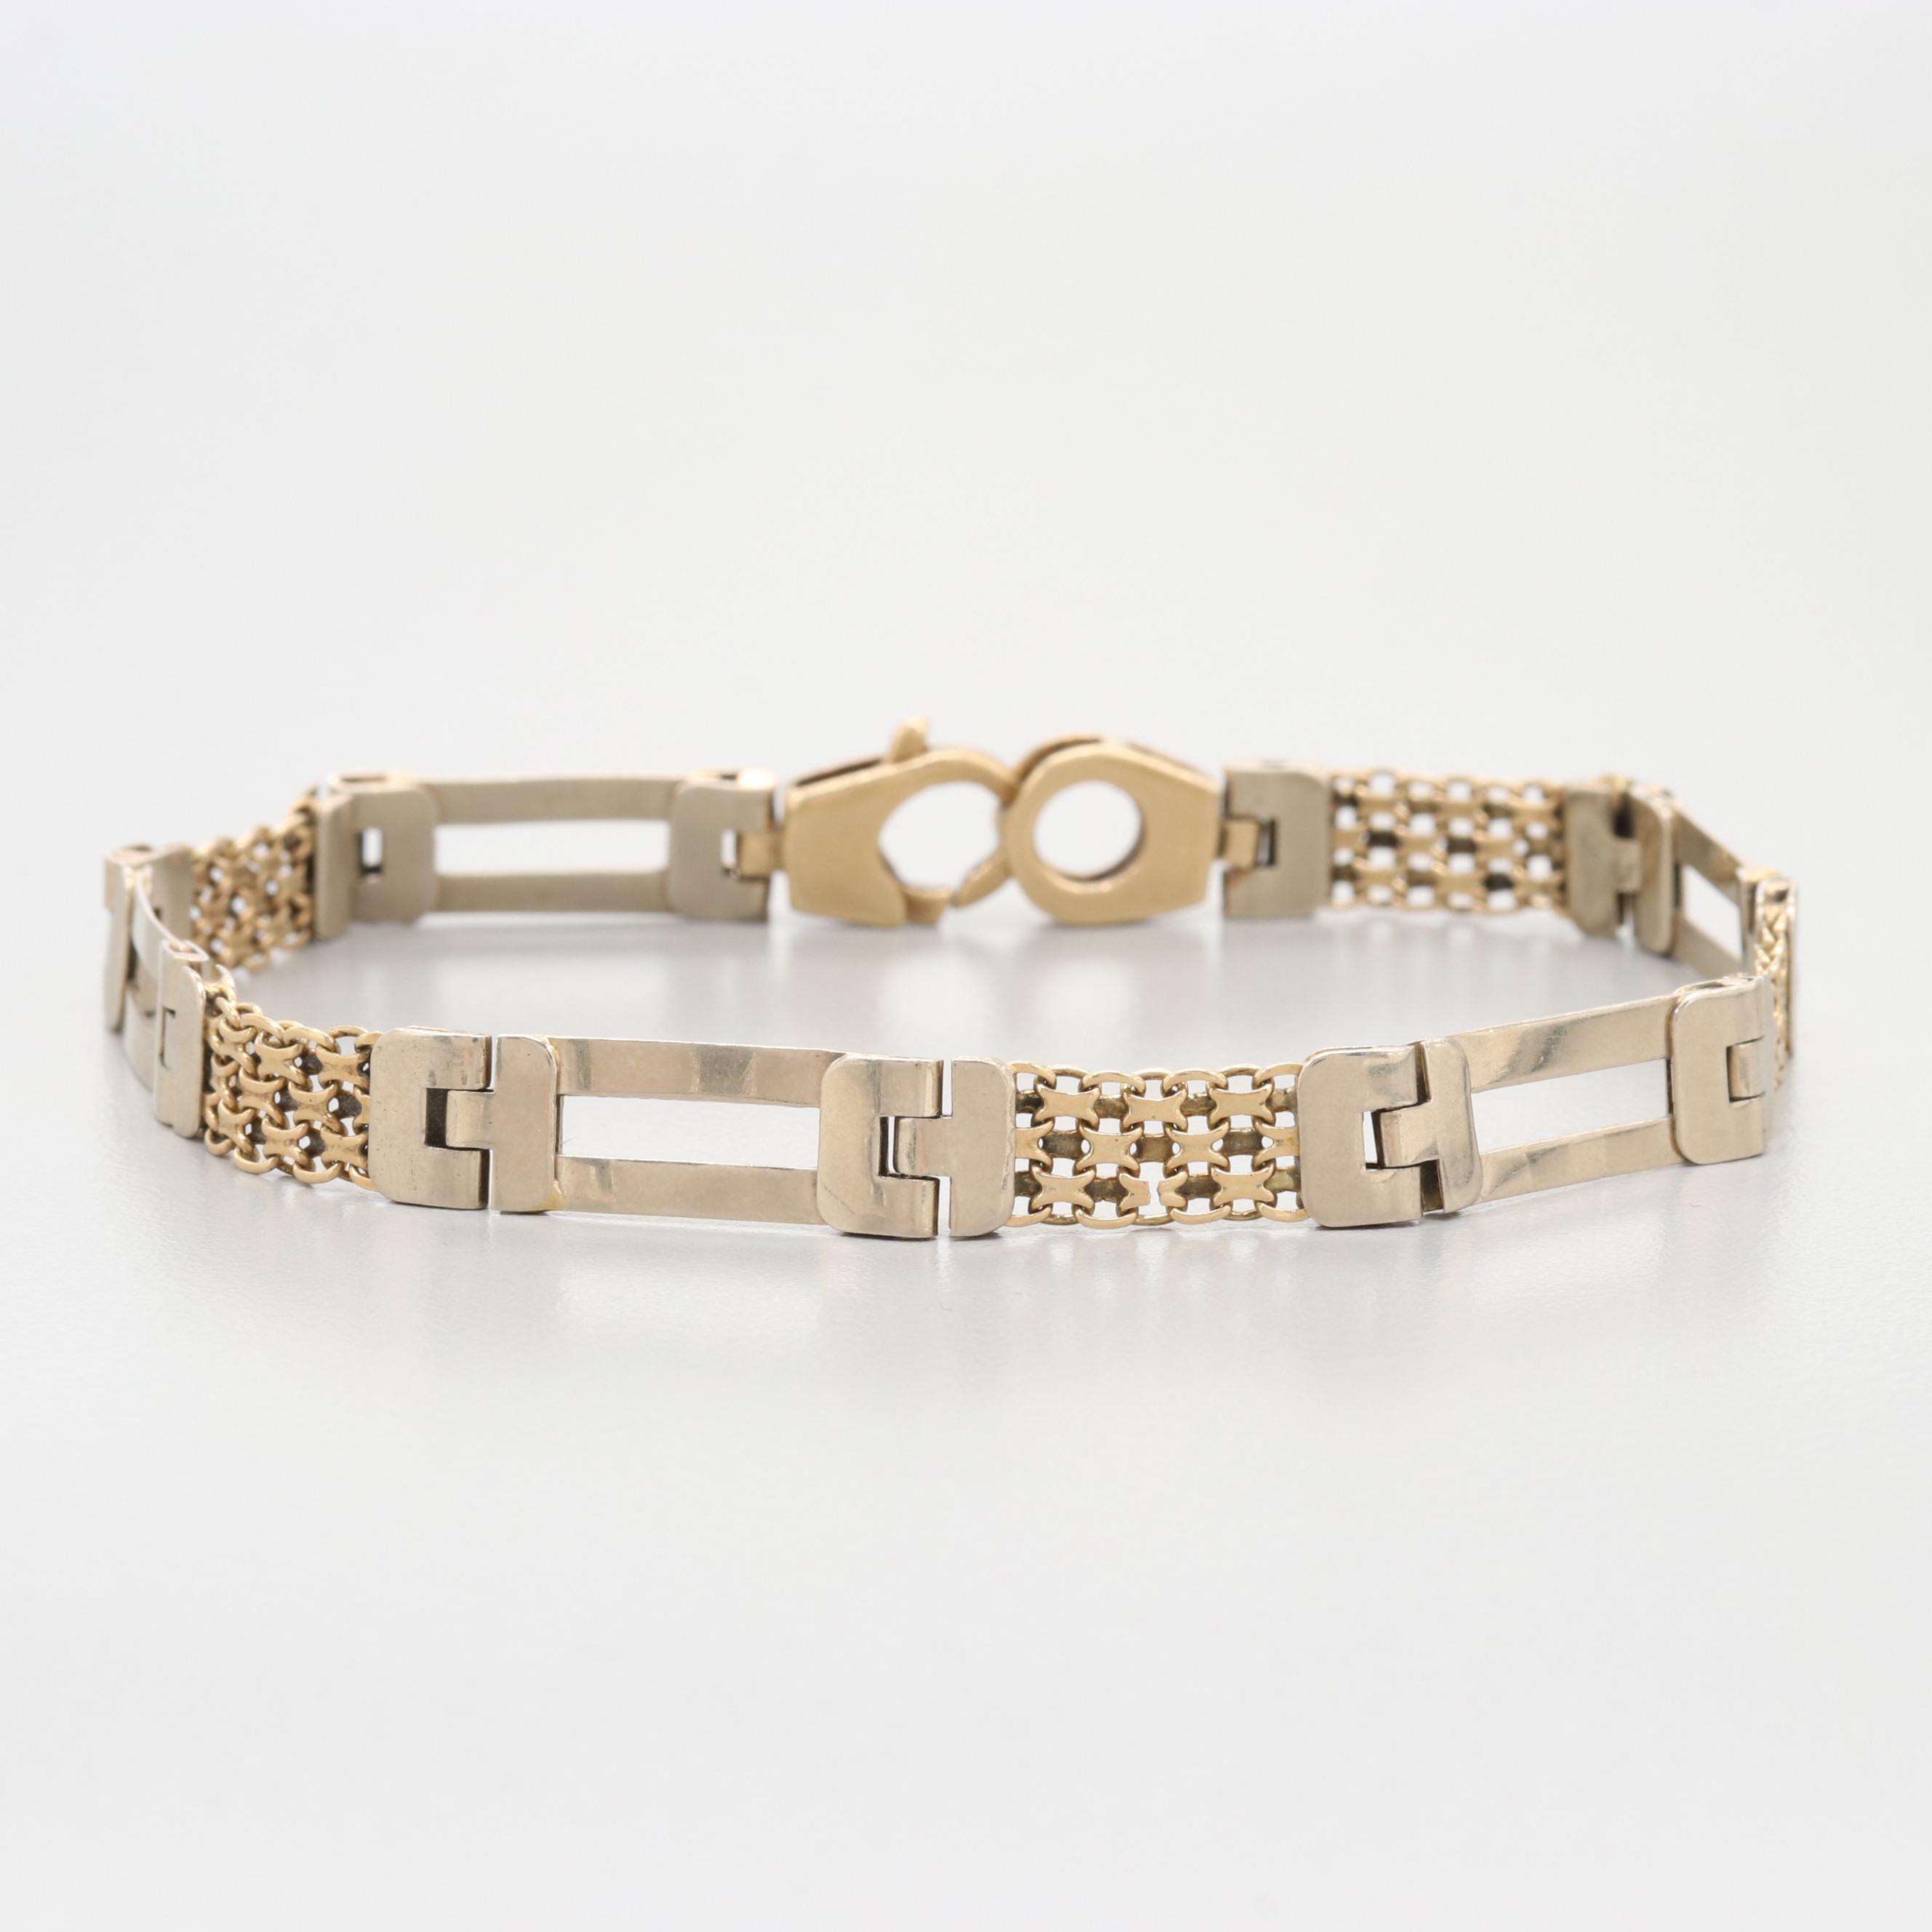 Italian 14K White and Yellow Gold Link Bracelet